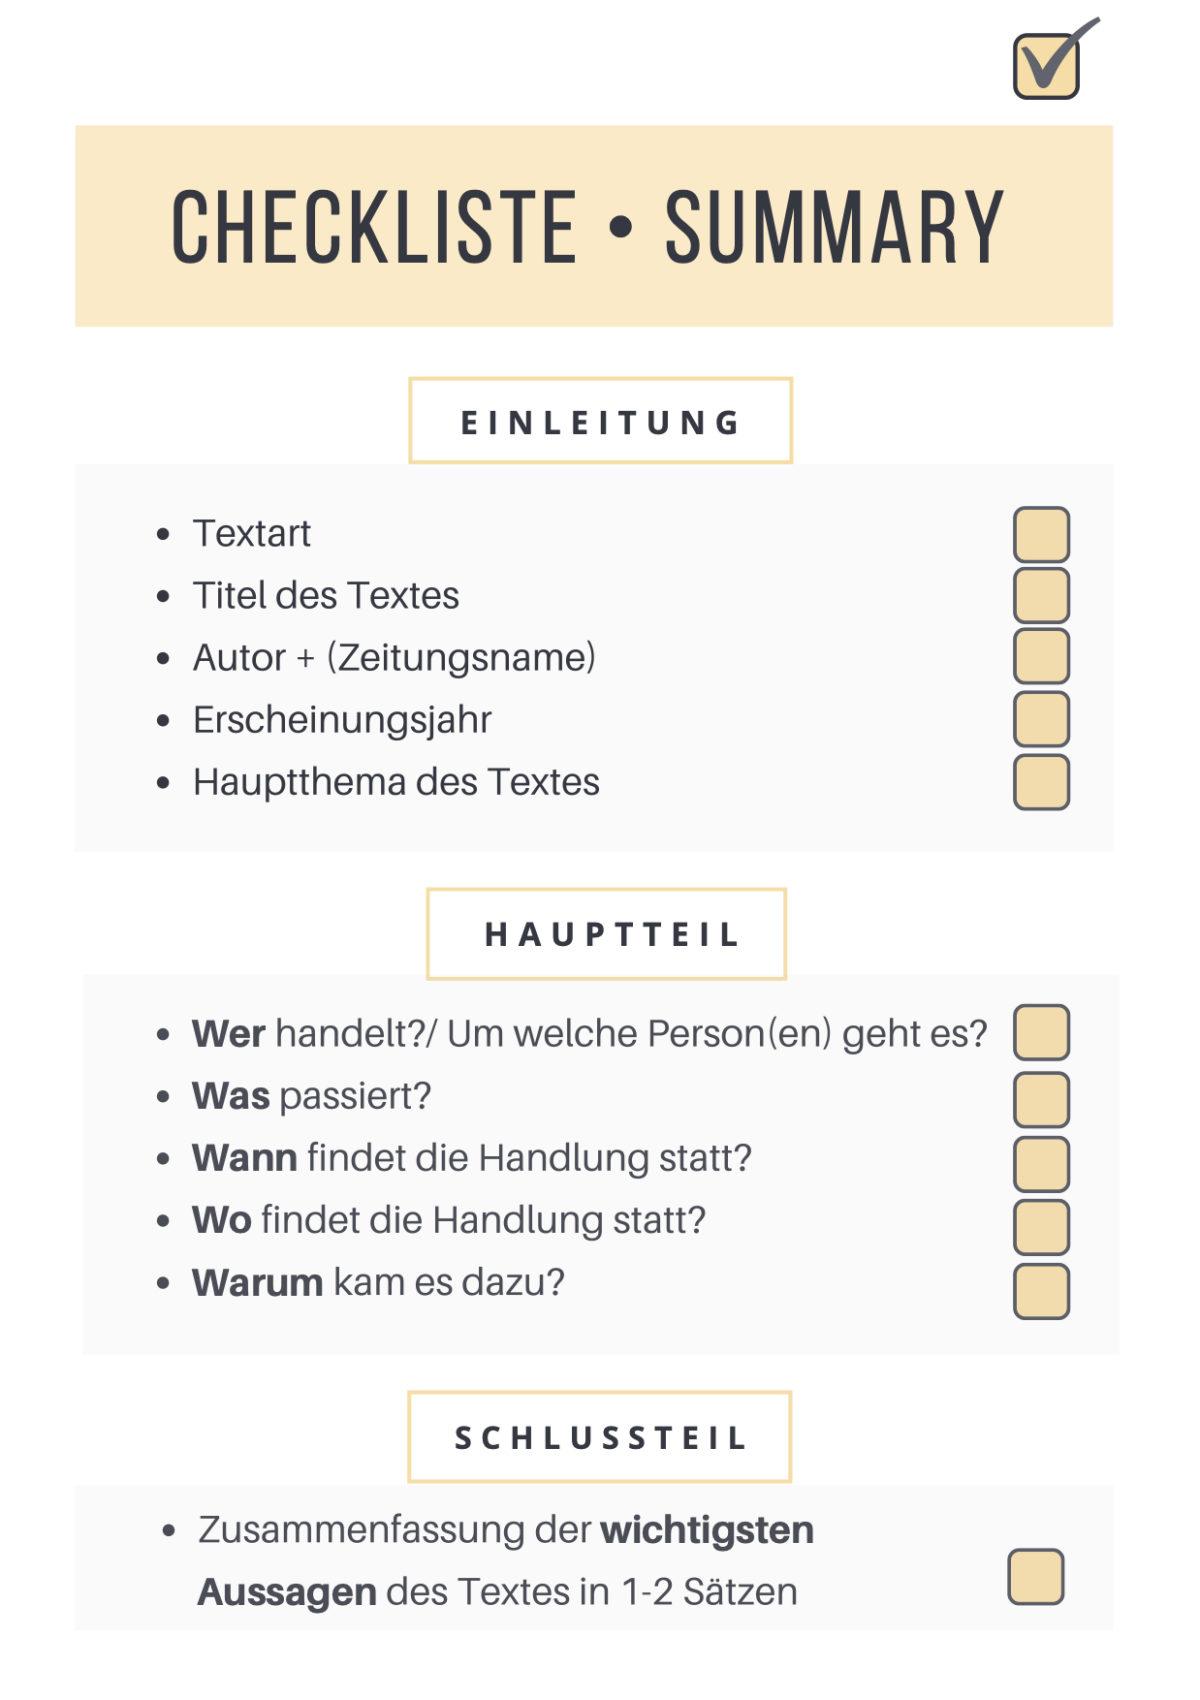 Checkliste • Summary JPG